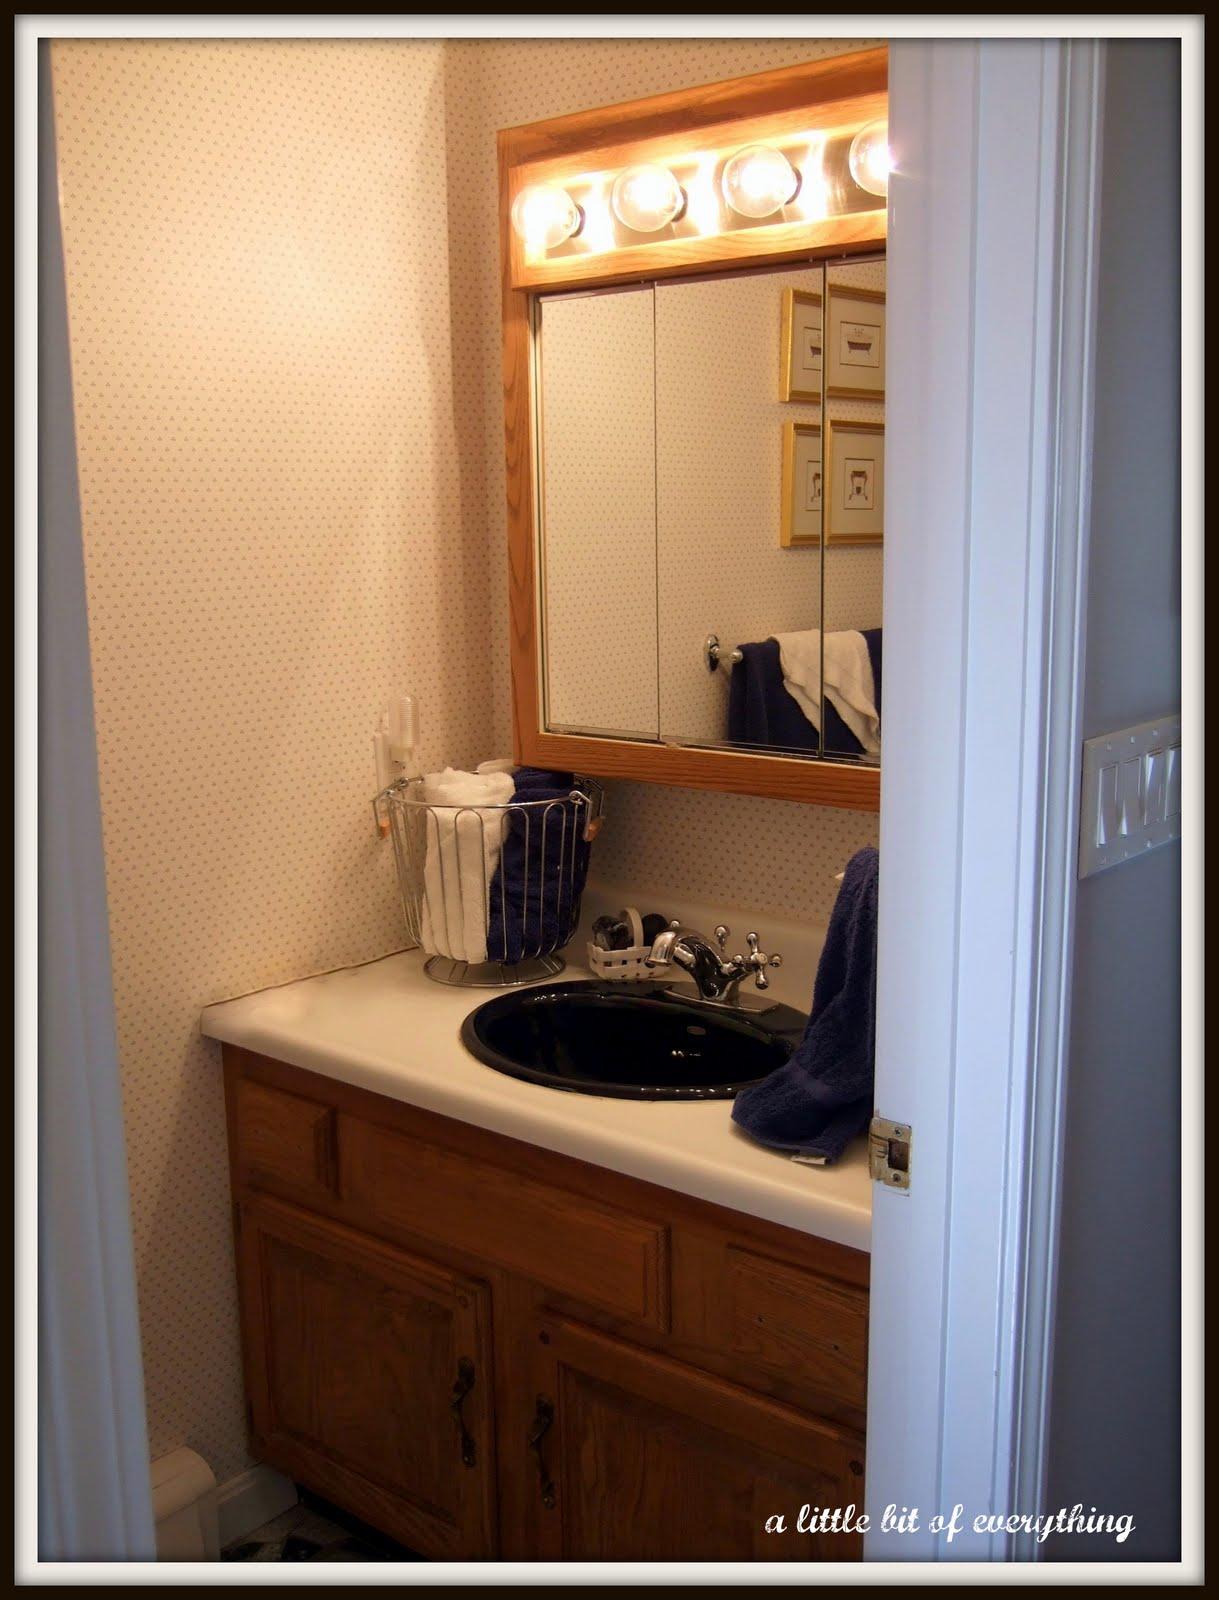 Bathroom Design Half Bath | Home Decorating IdeasBathroom ...